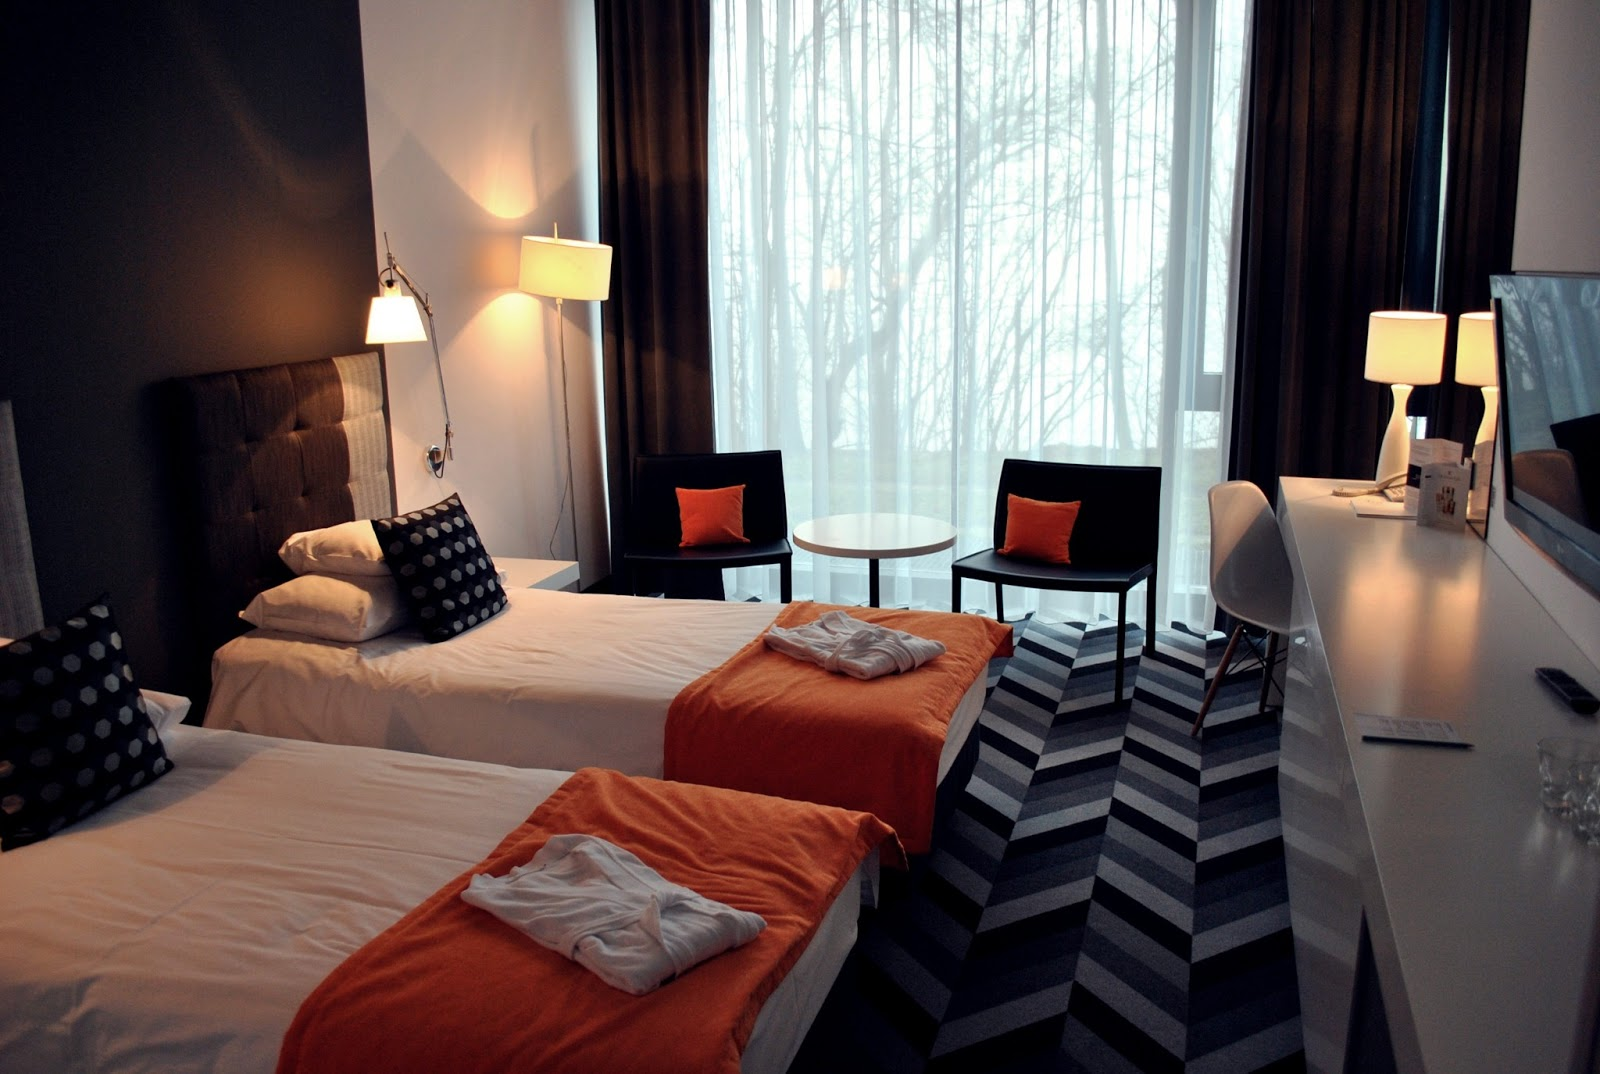 Patryk strza a blog poziom 511 design hotel spa 1 for Hotel design poziom 511